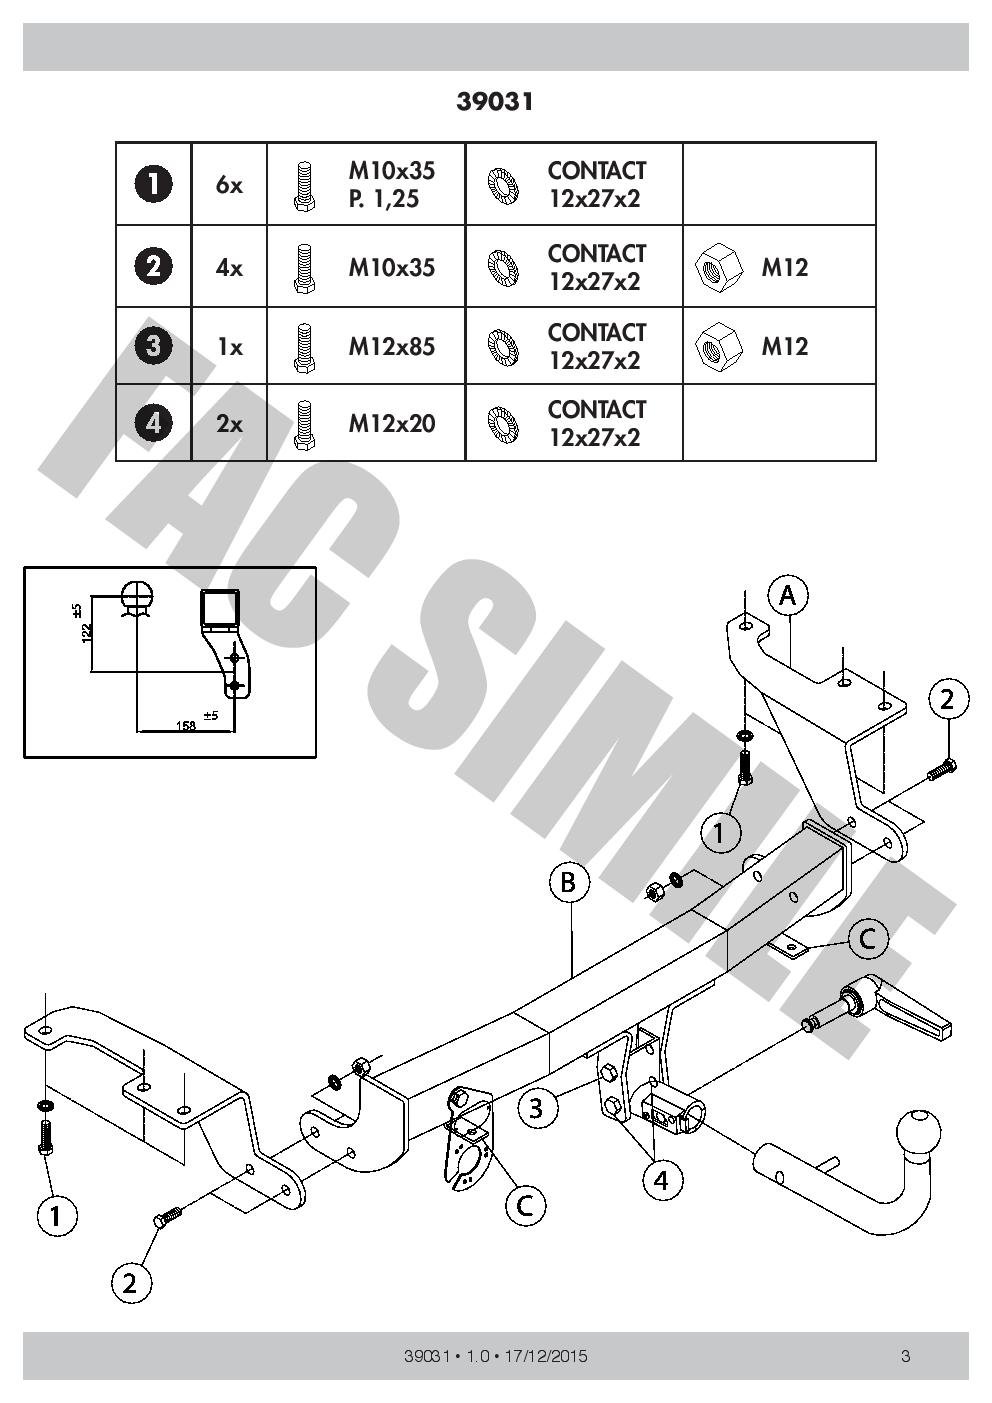 Detach Towbar 13pin C2 Wiring Kit For Toyota Verso Mpv 09 On Tow 13 Pin Diagram